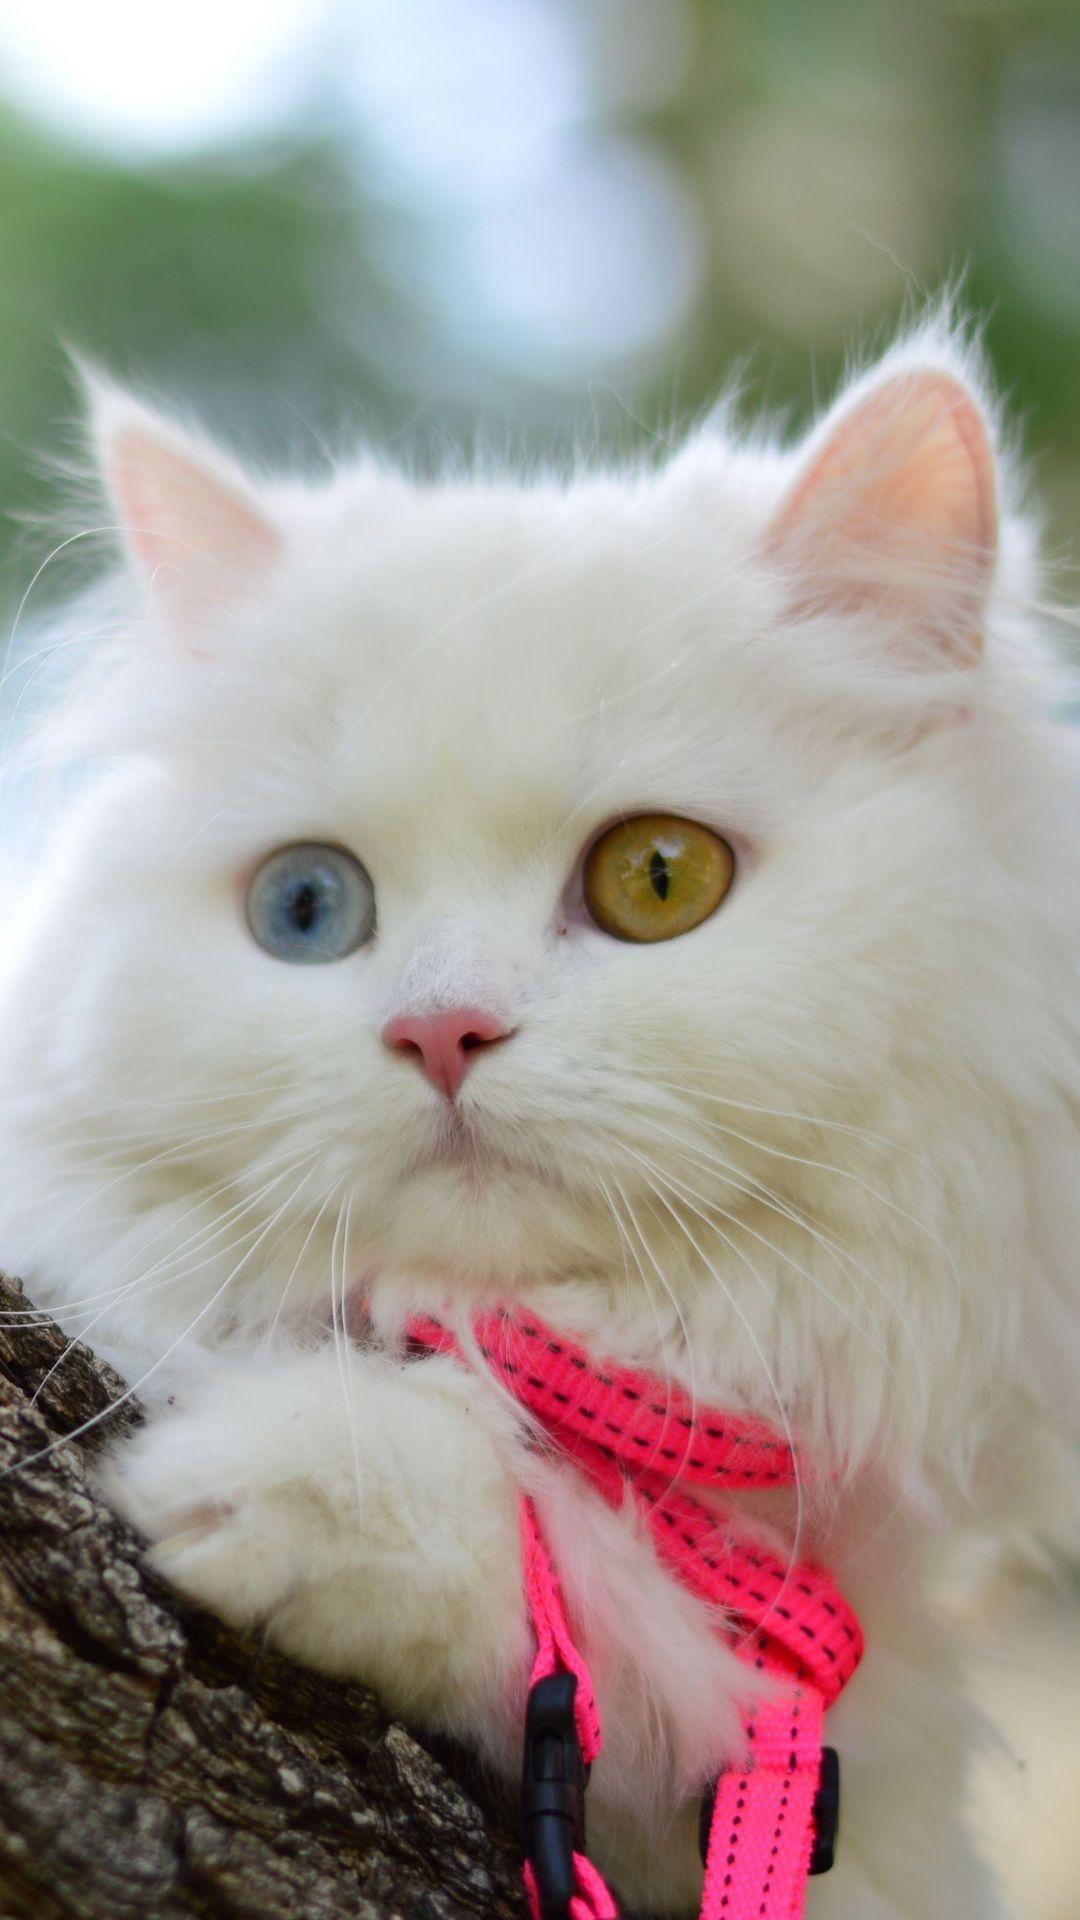 WallpaperFusion-pretty-kitty-Original-1080x1920.jpg